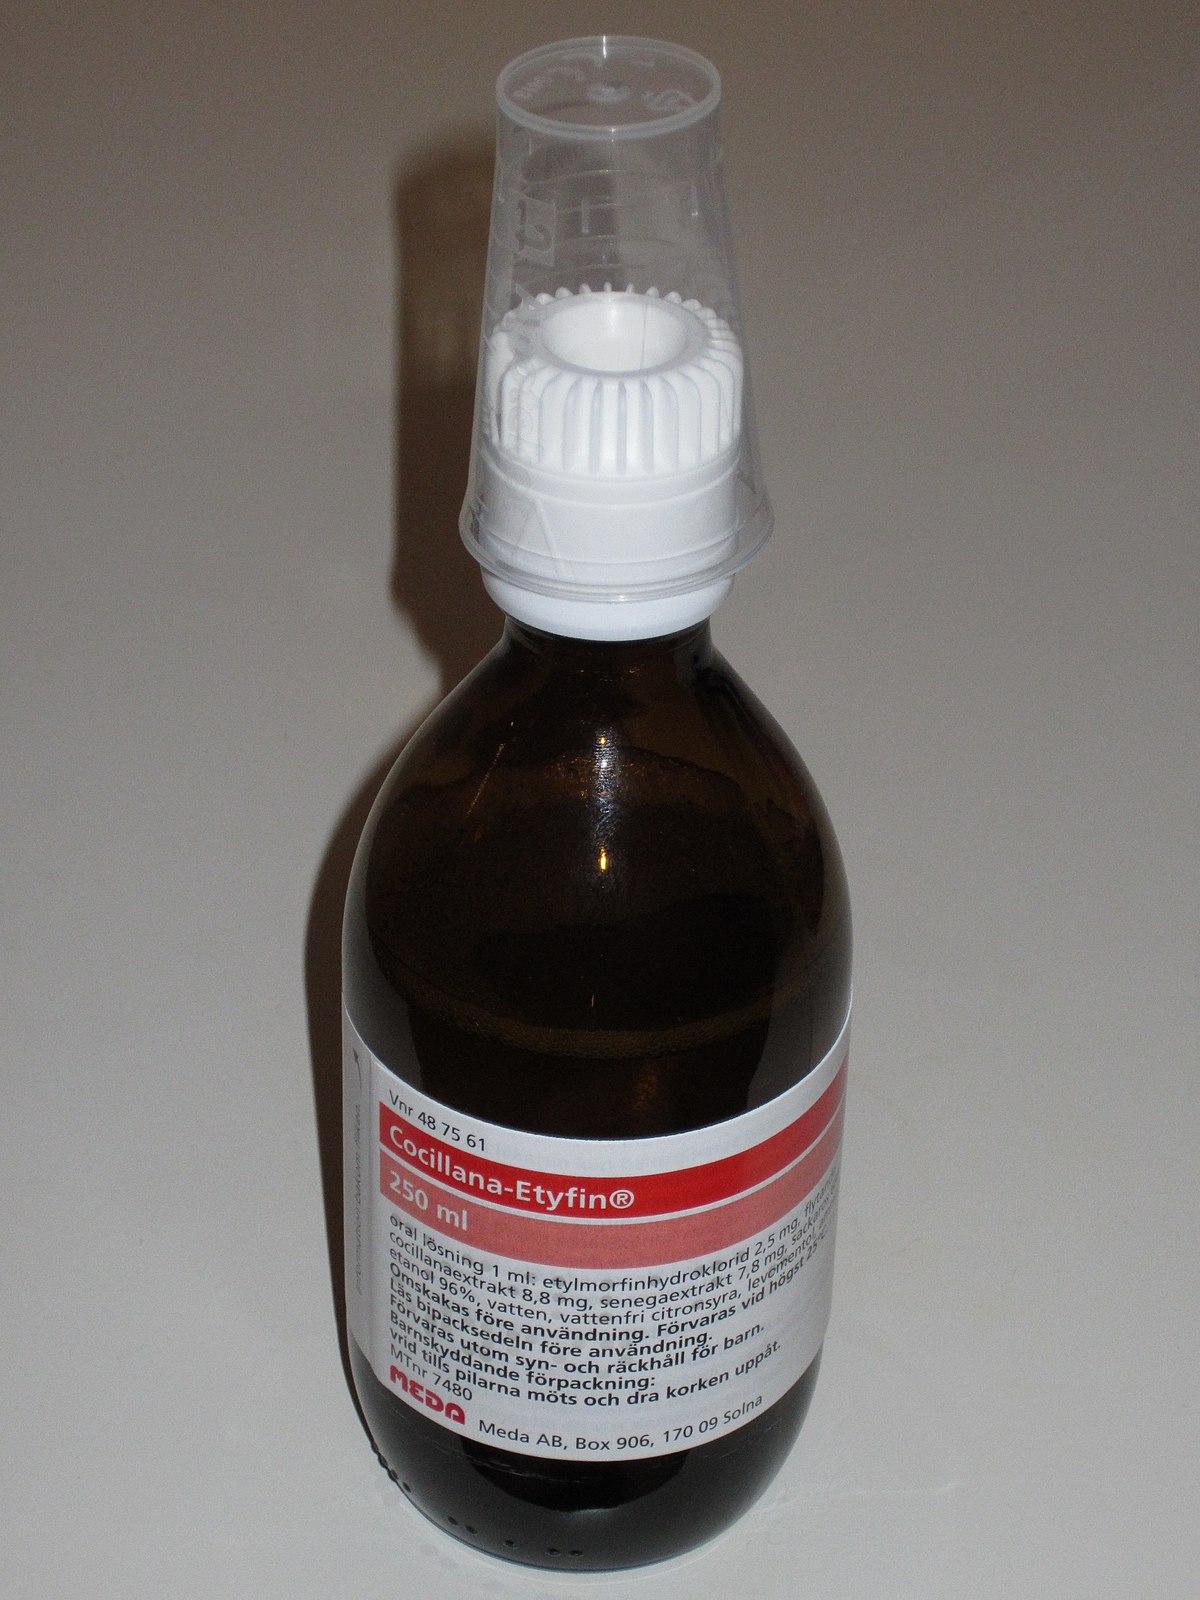 medicin mot torrhosta